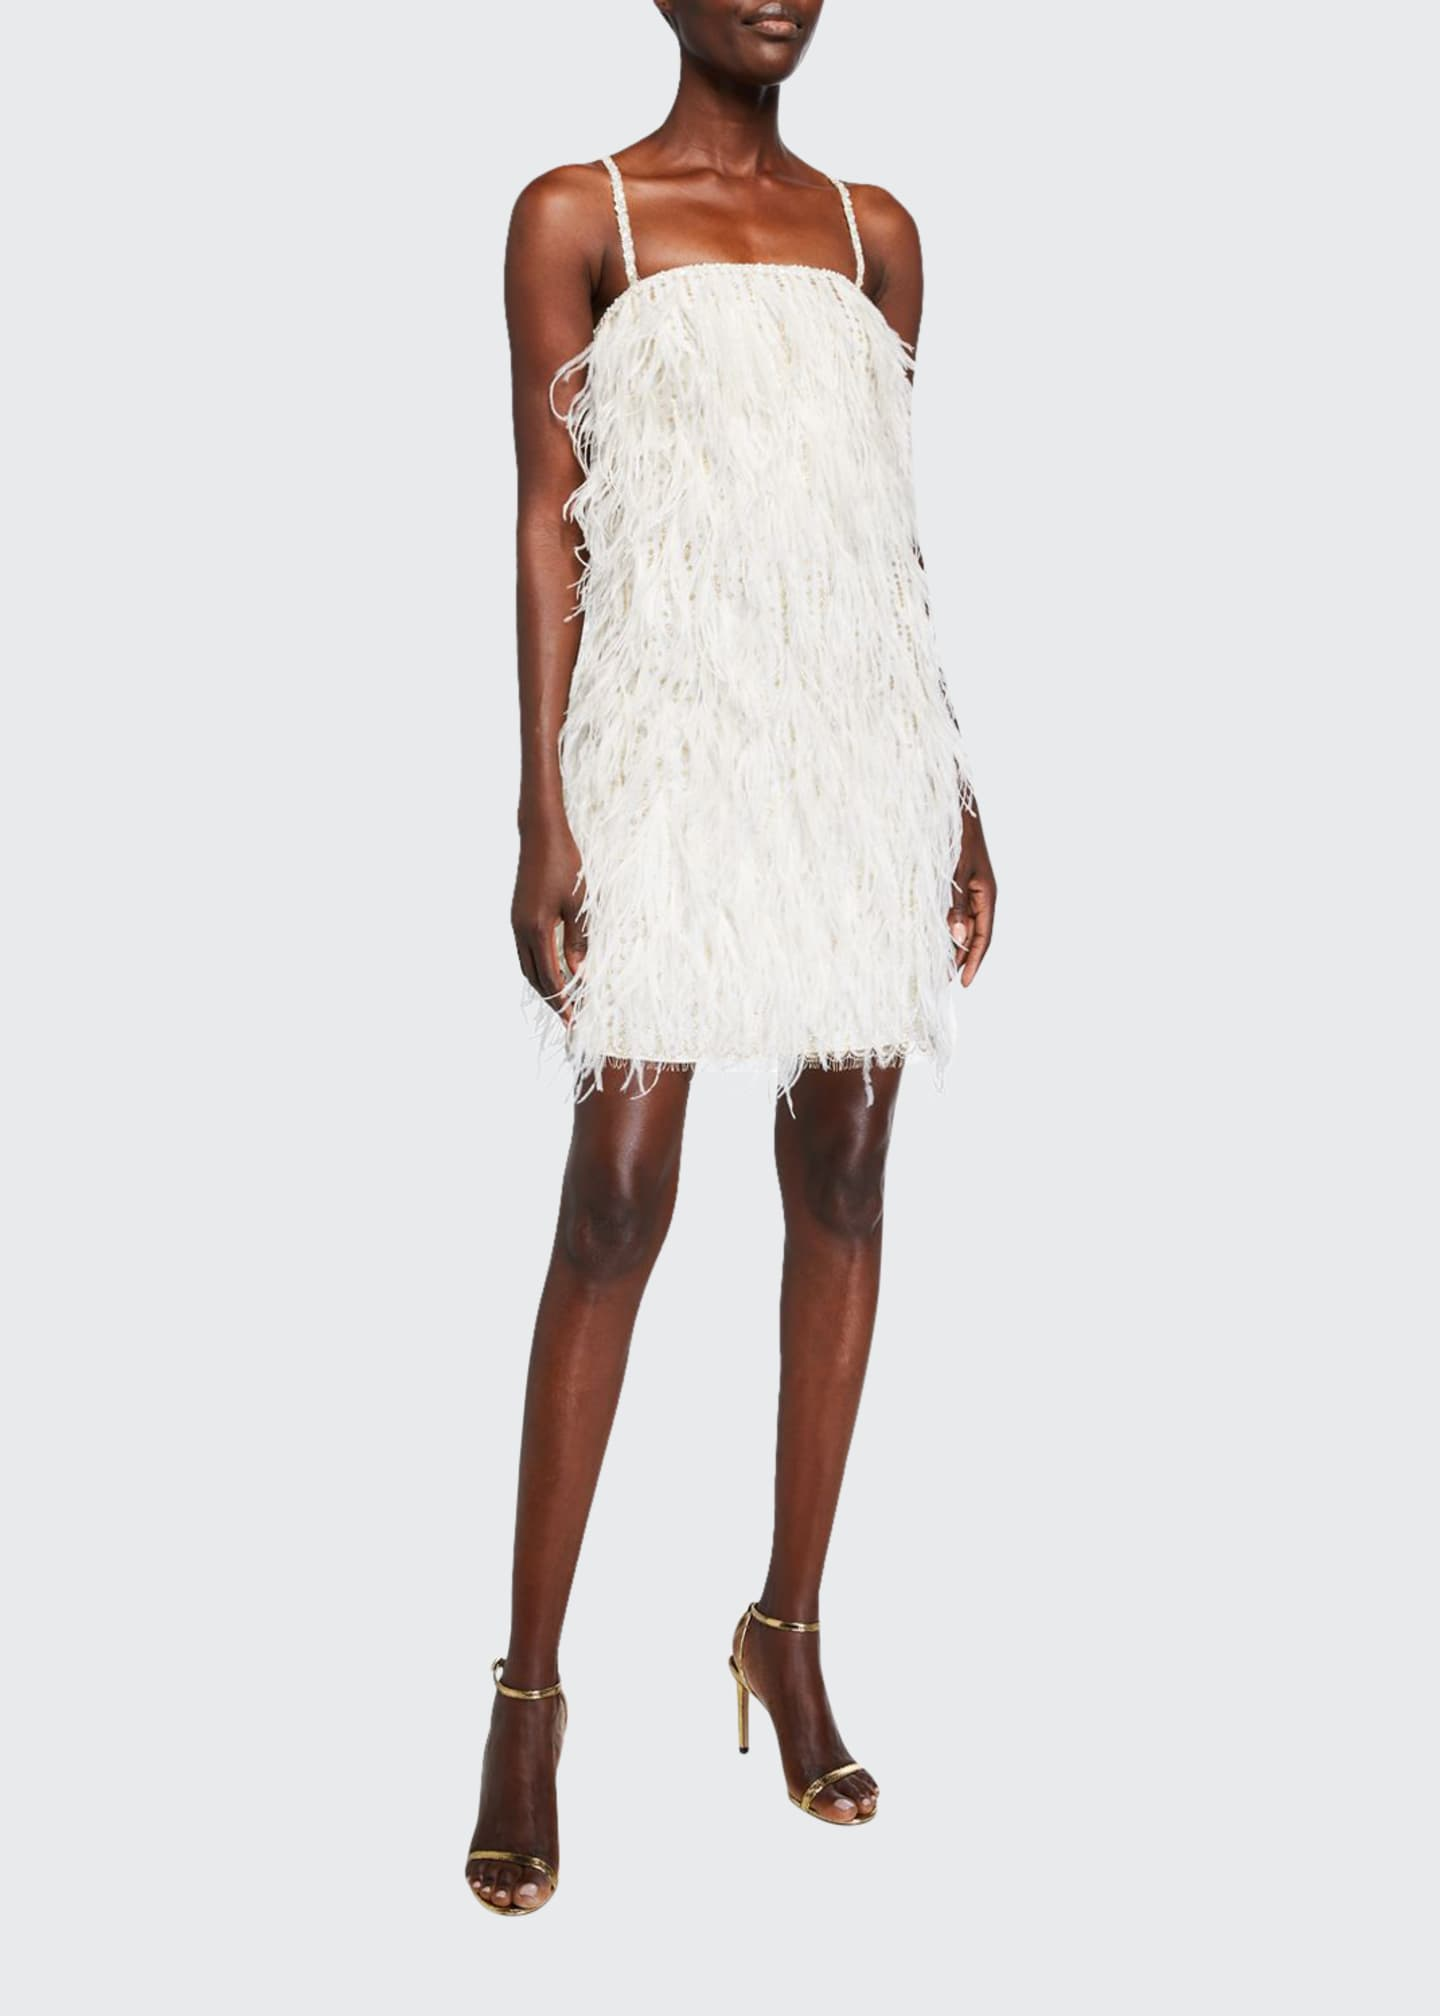 Monique Lhuillier Feathered Mini Shift Dress